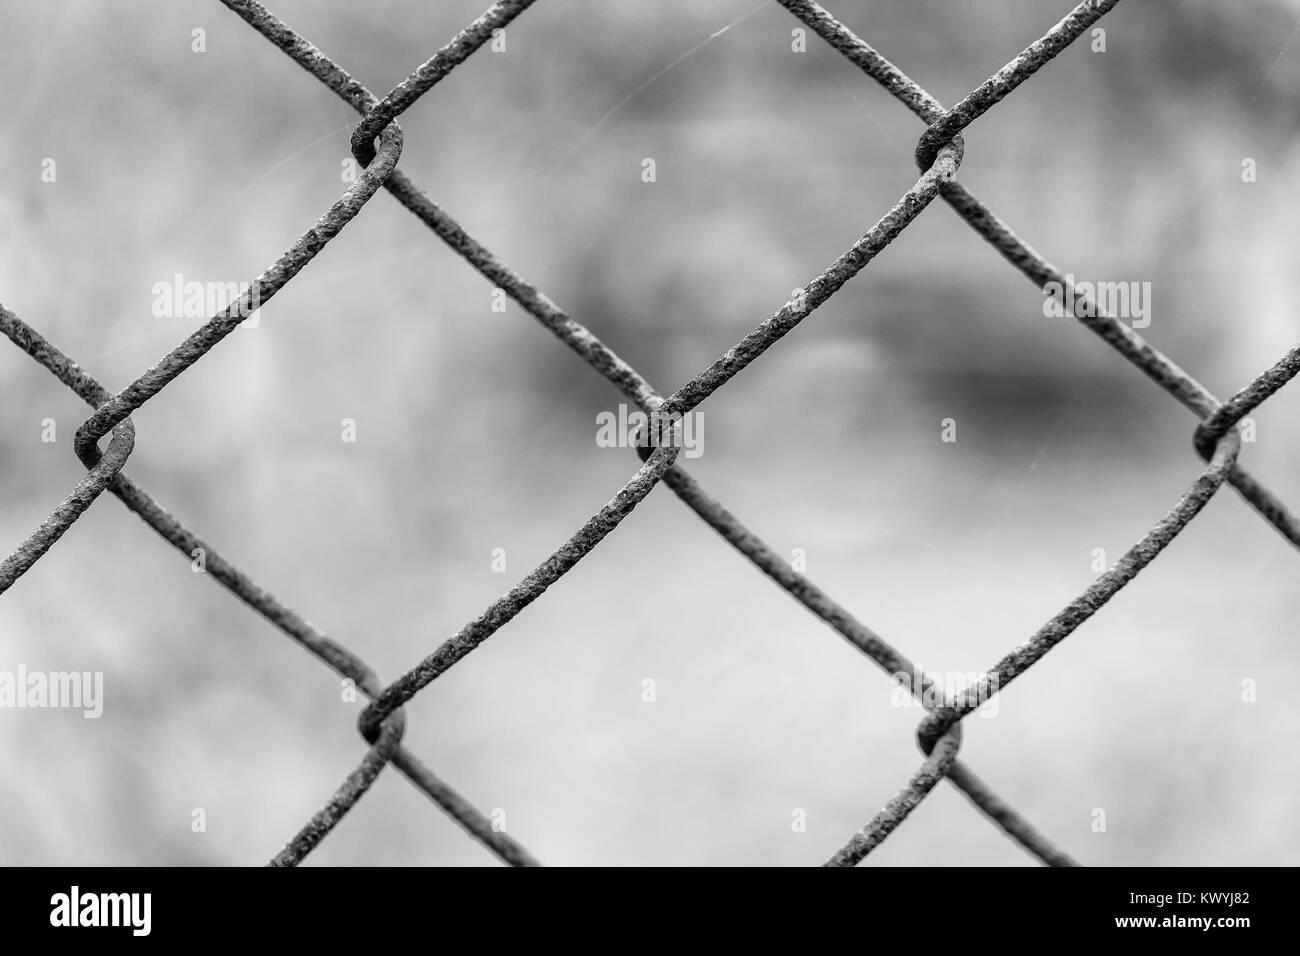 Beautiful netting mesh pattern on a blurred background. Rust. - Stock Image